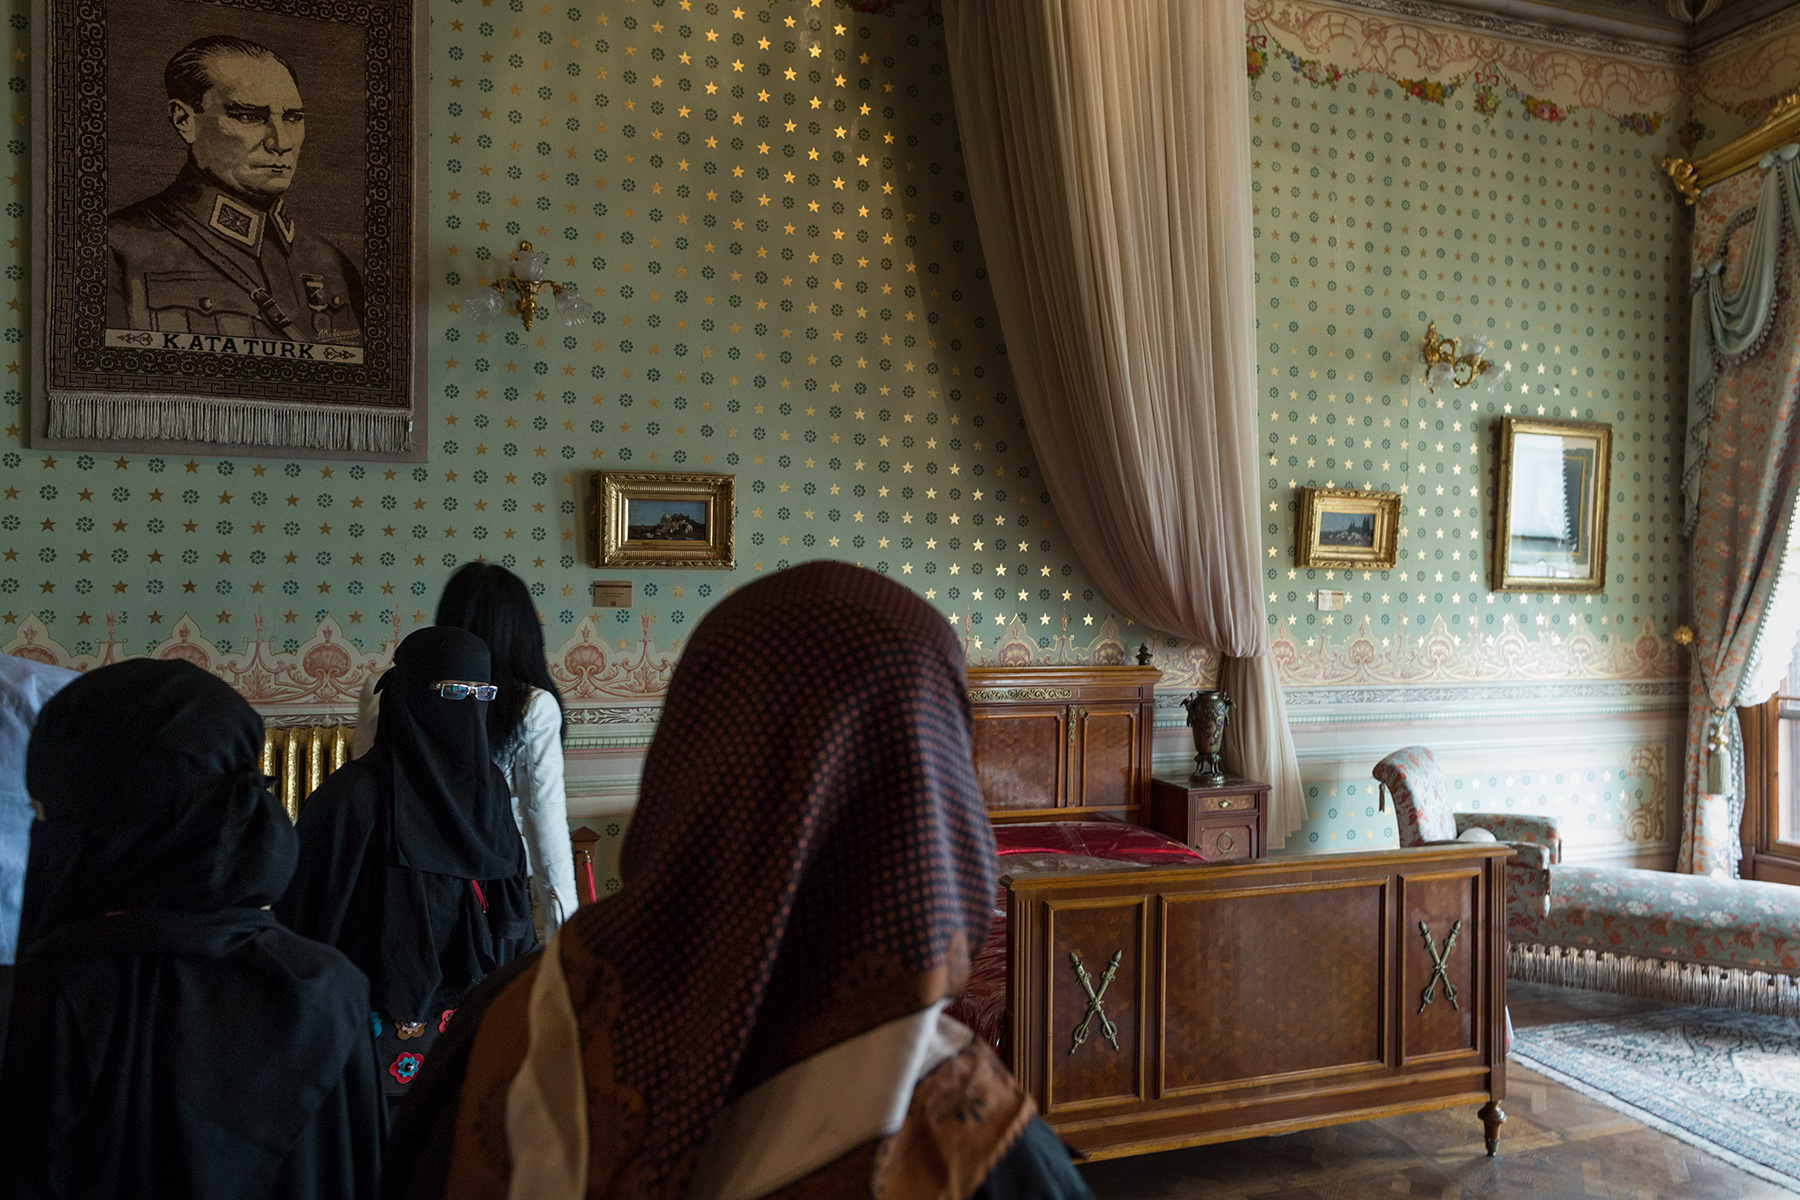 Turkey, 2017 - Women wearing niqab and hijab visit the death room of Atatürk.